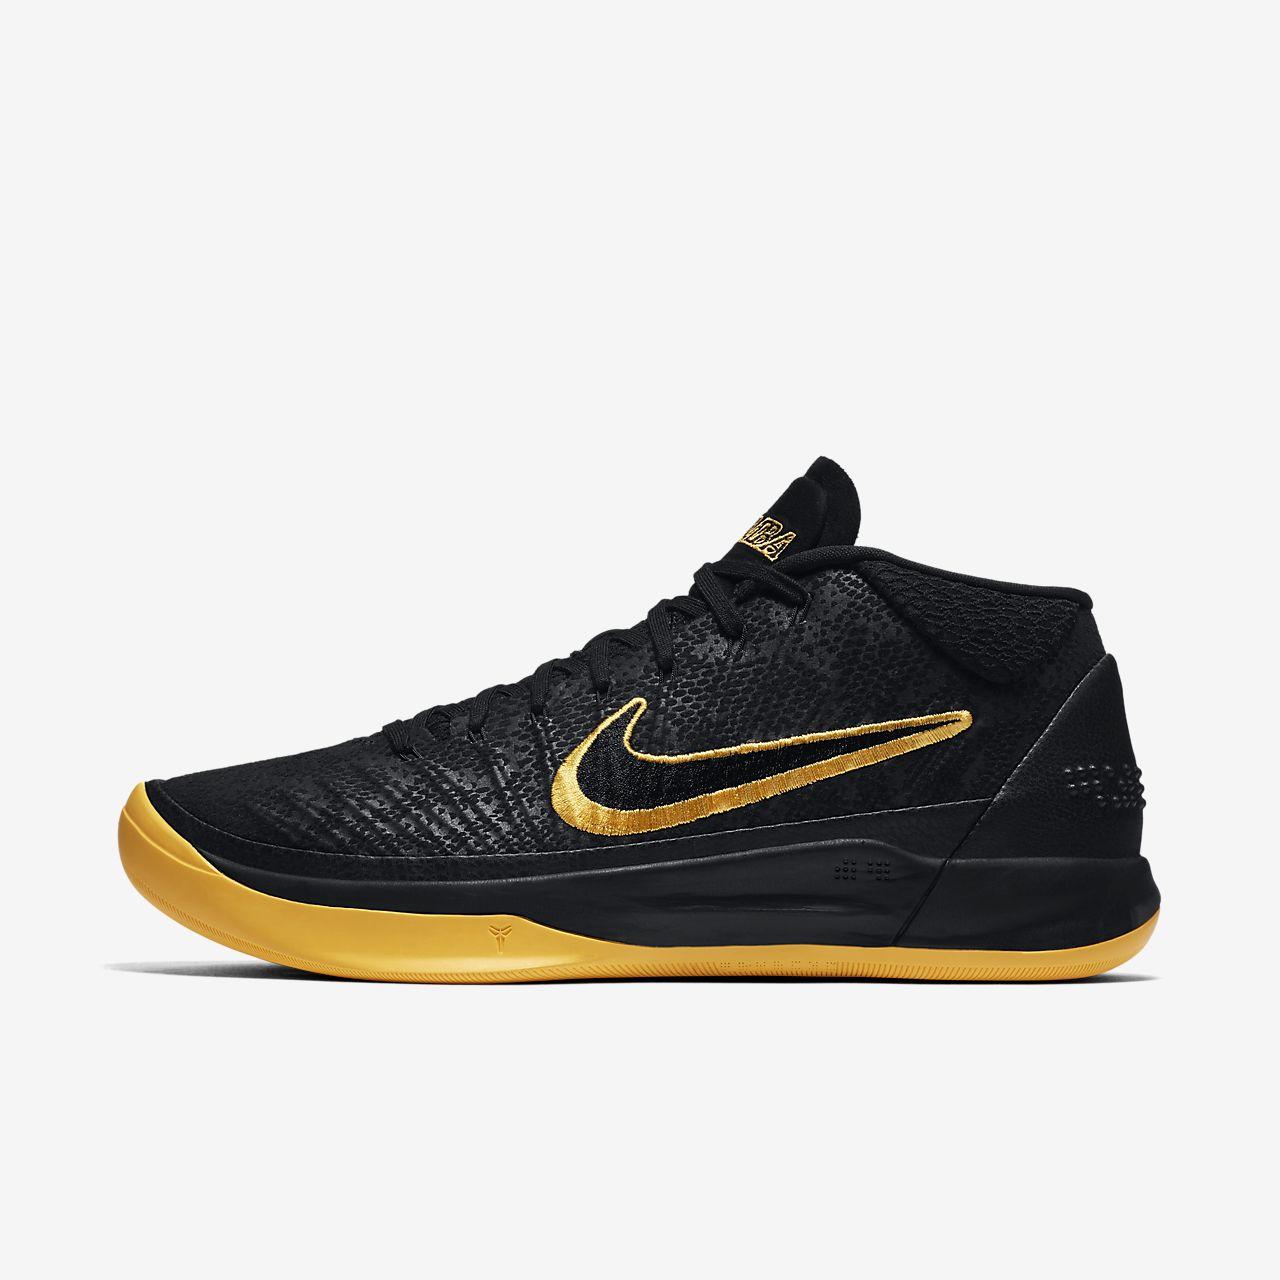 ... Nike Kobe A.D. Black Mamba Basketbalschoen voor heren